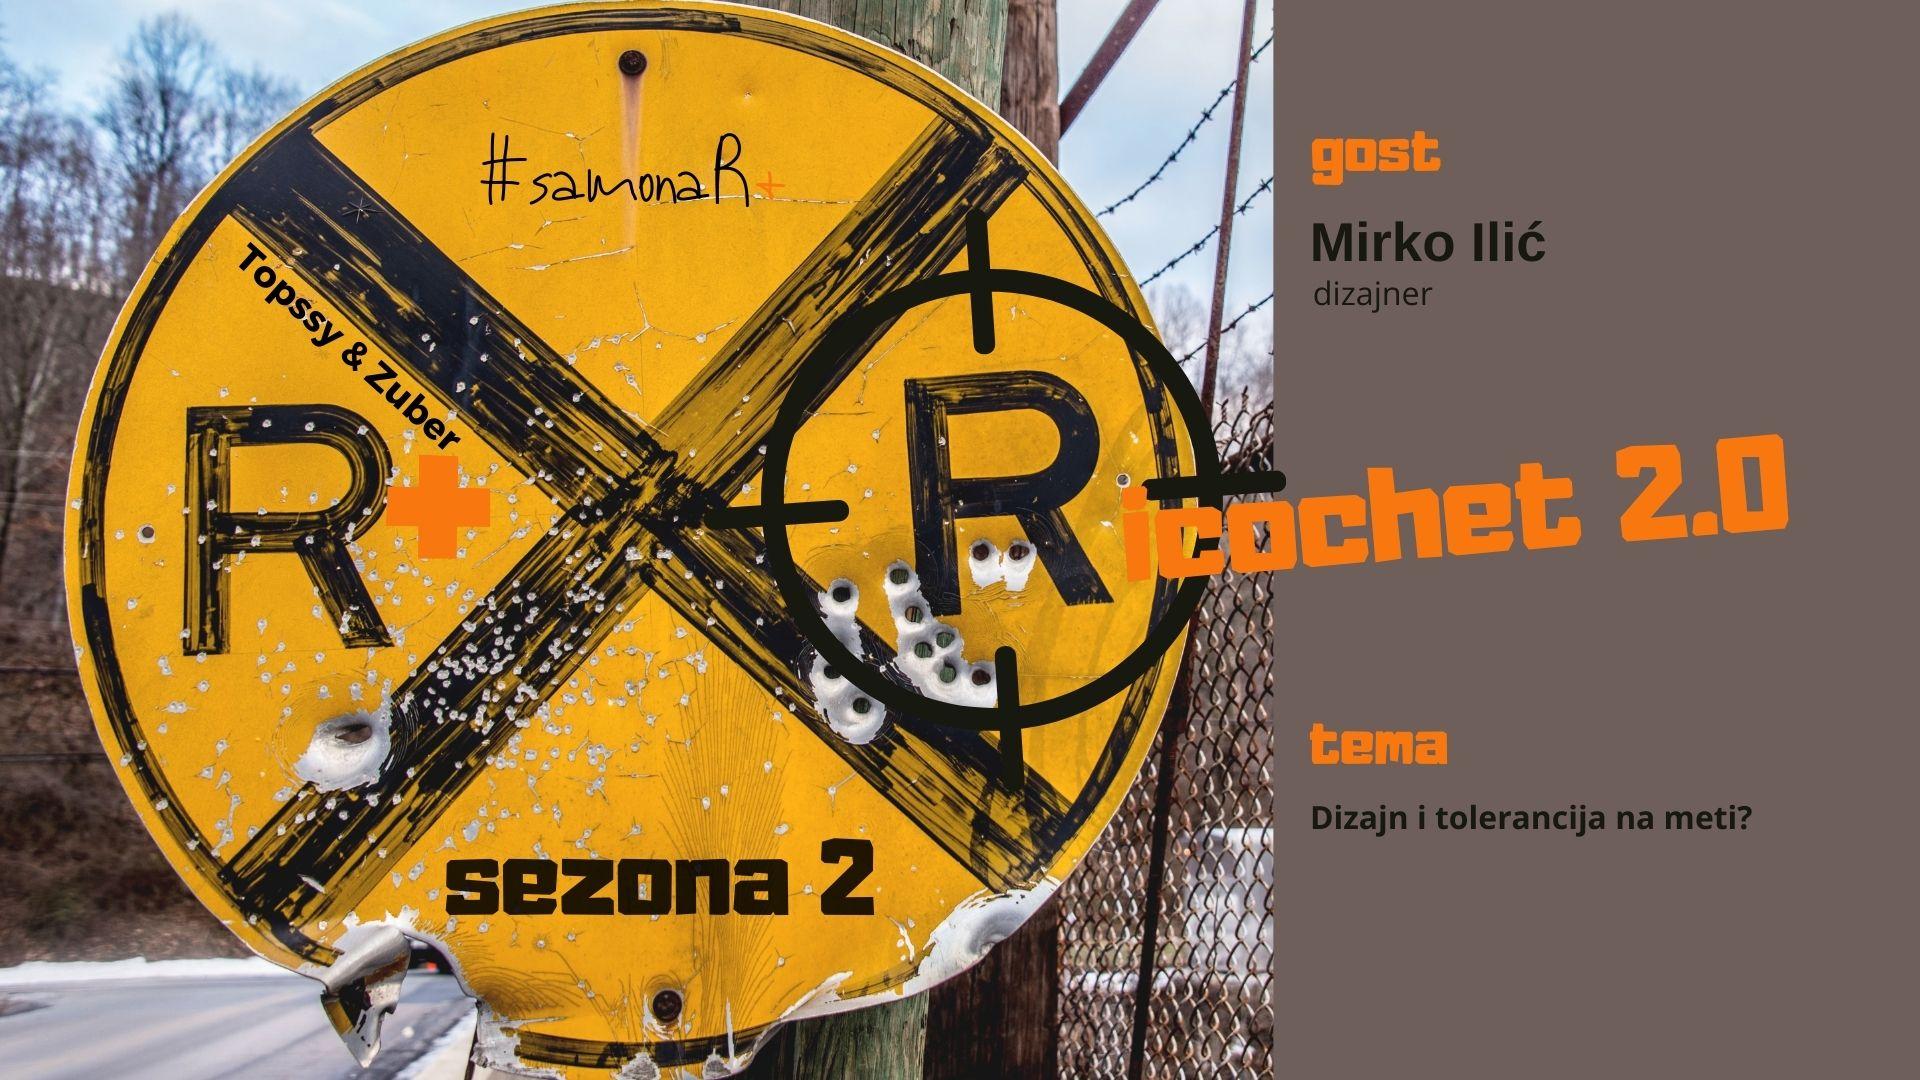 R+: Ricochet 2.0 w. Mirko Ili?   Dizajn i tolerancija na meti?